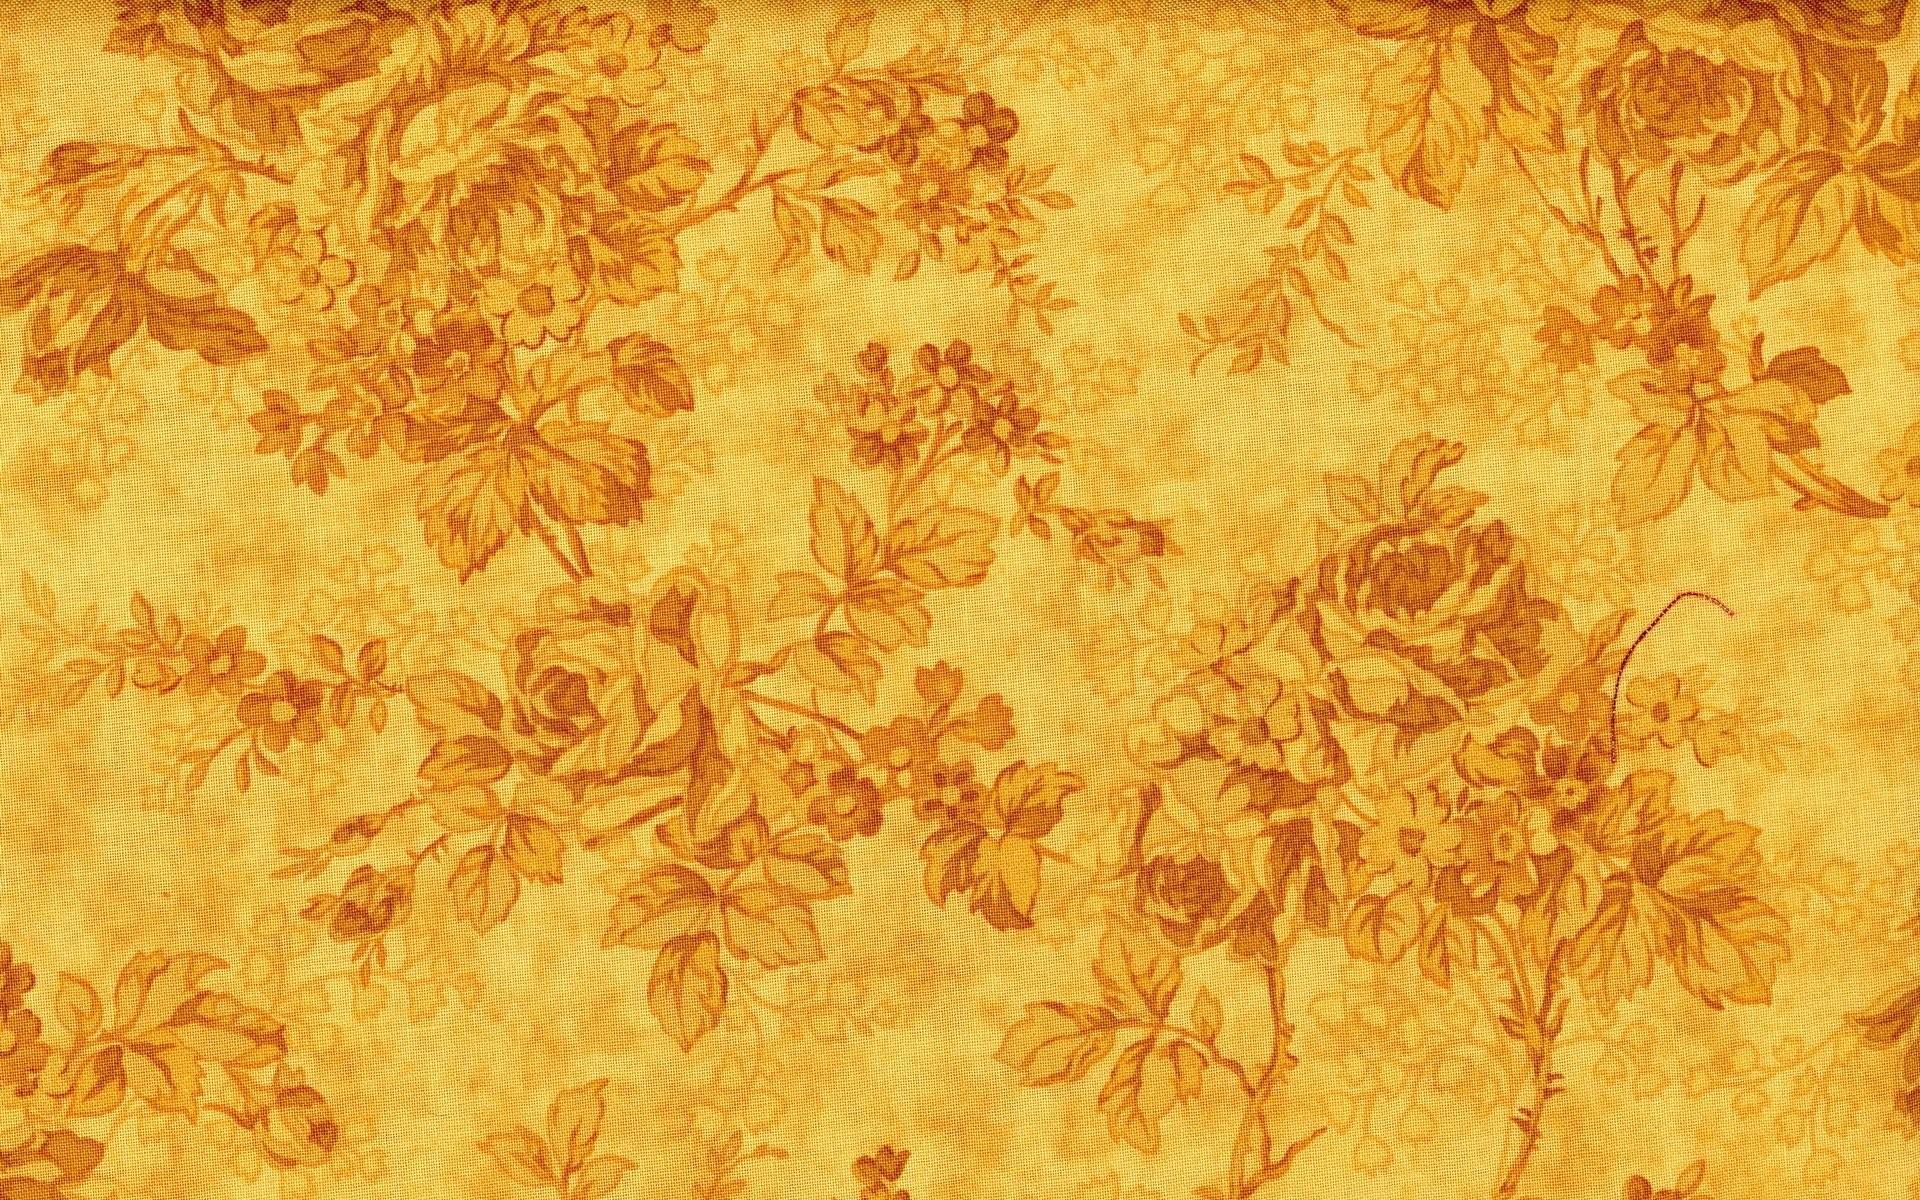 Gold Texture; gold foil texture